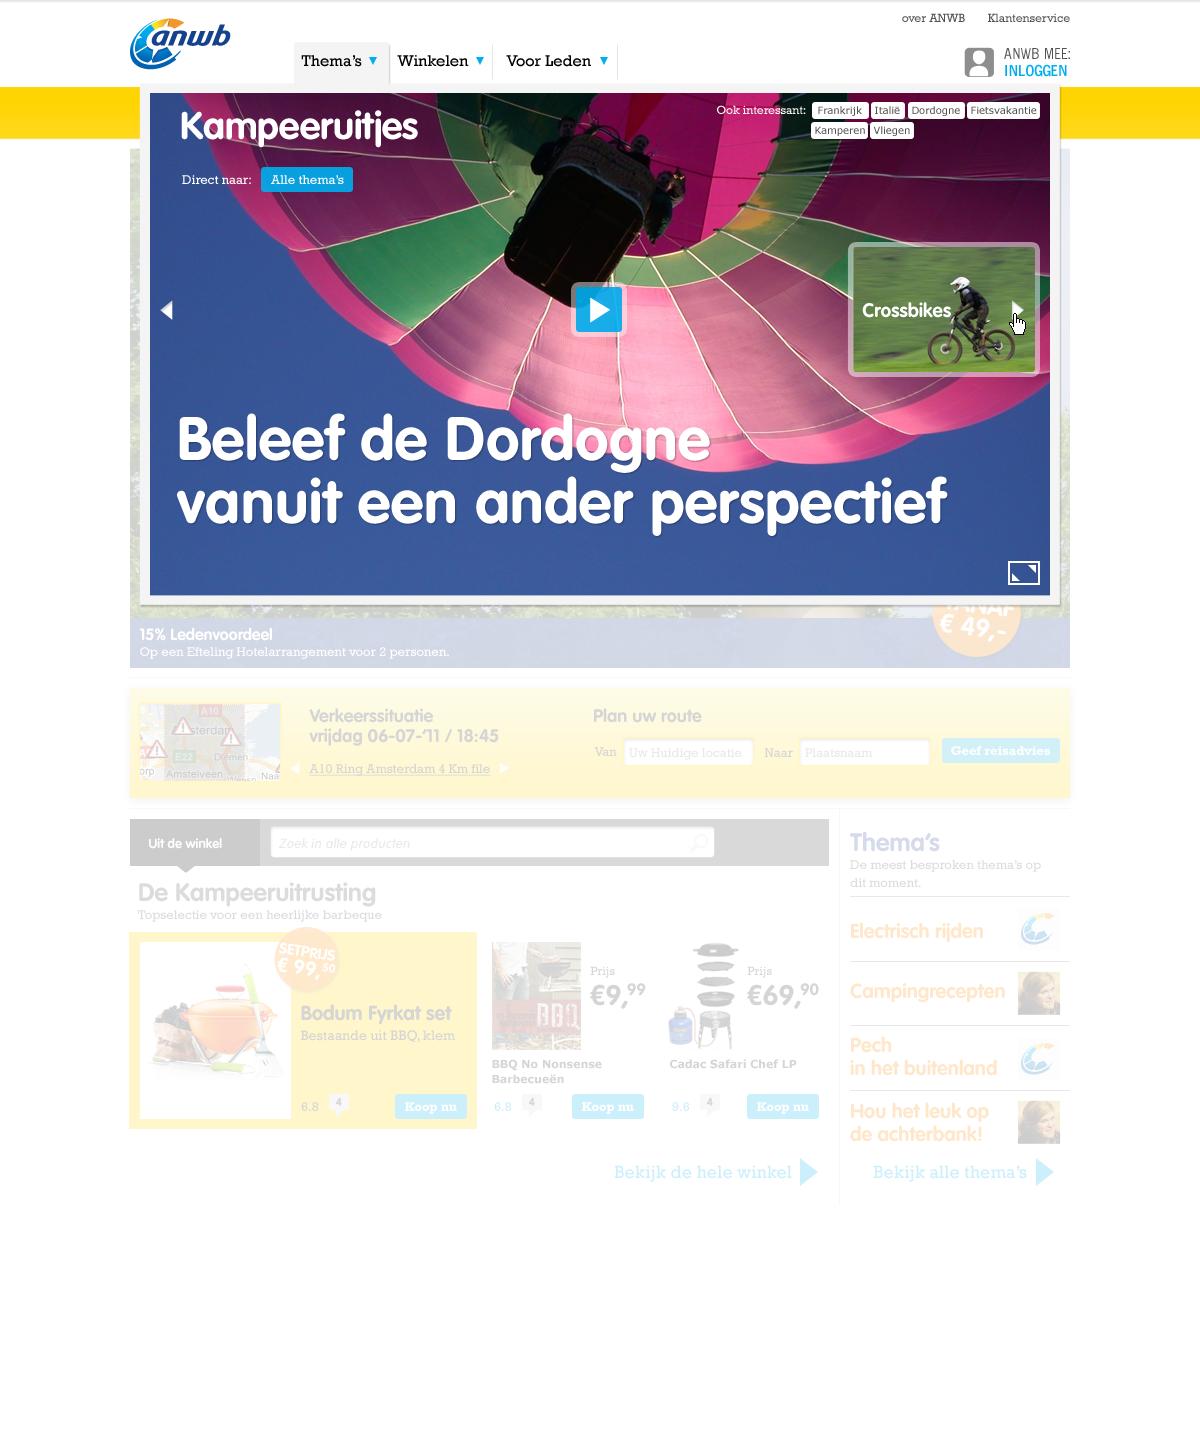 ANWB Homepage Experience Dropdown